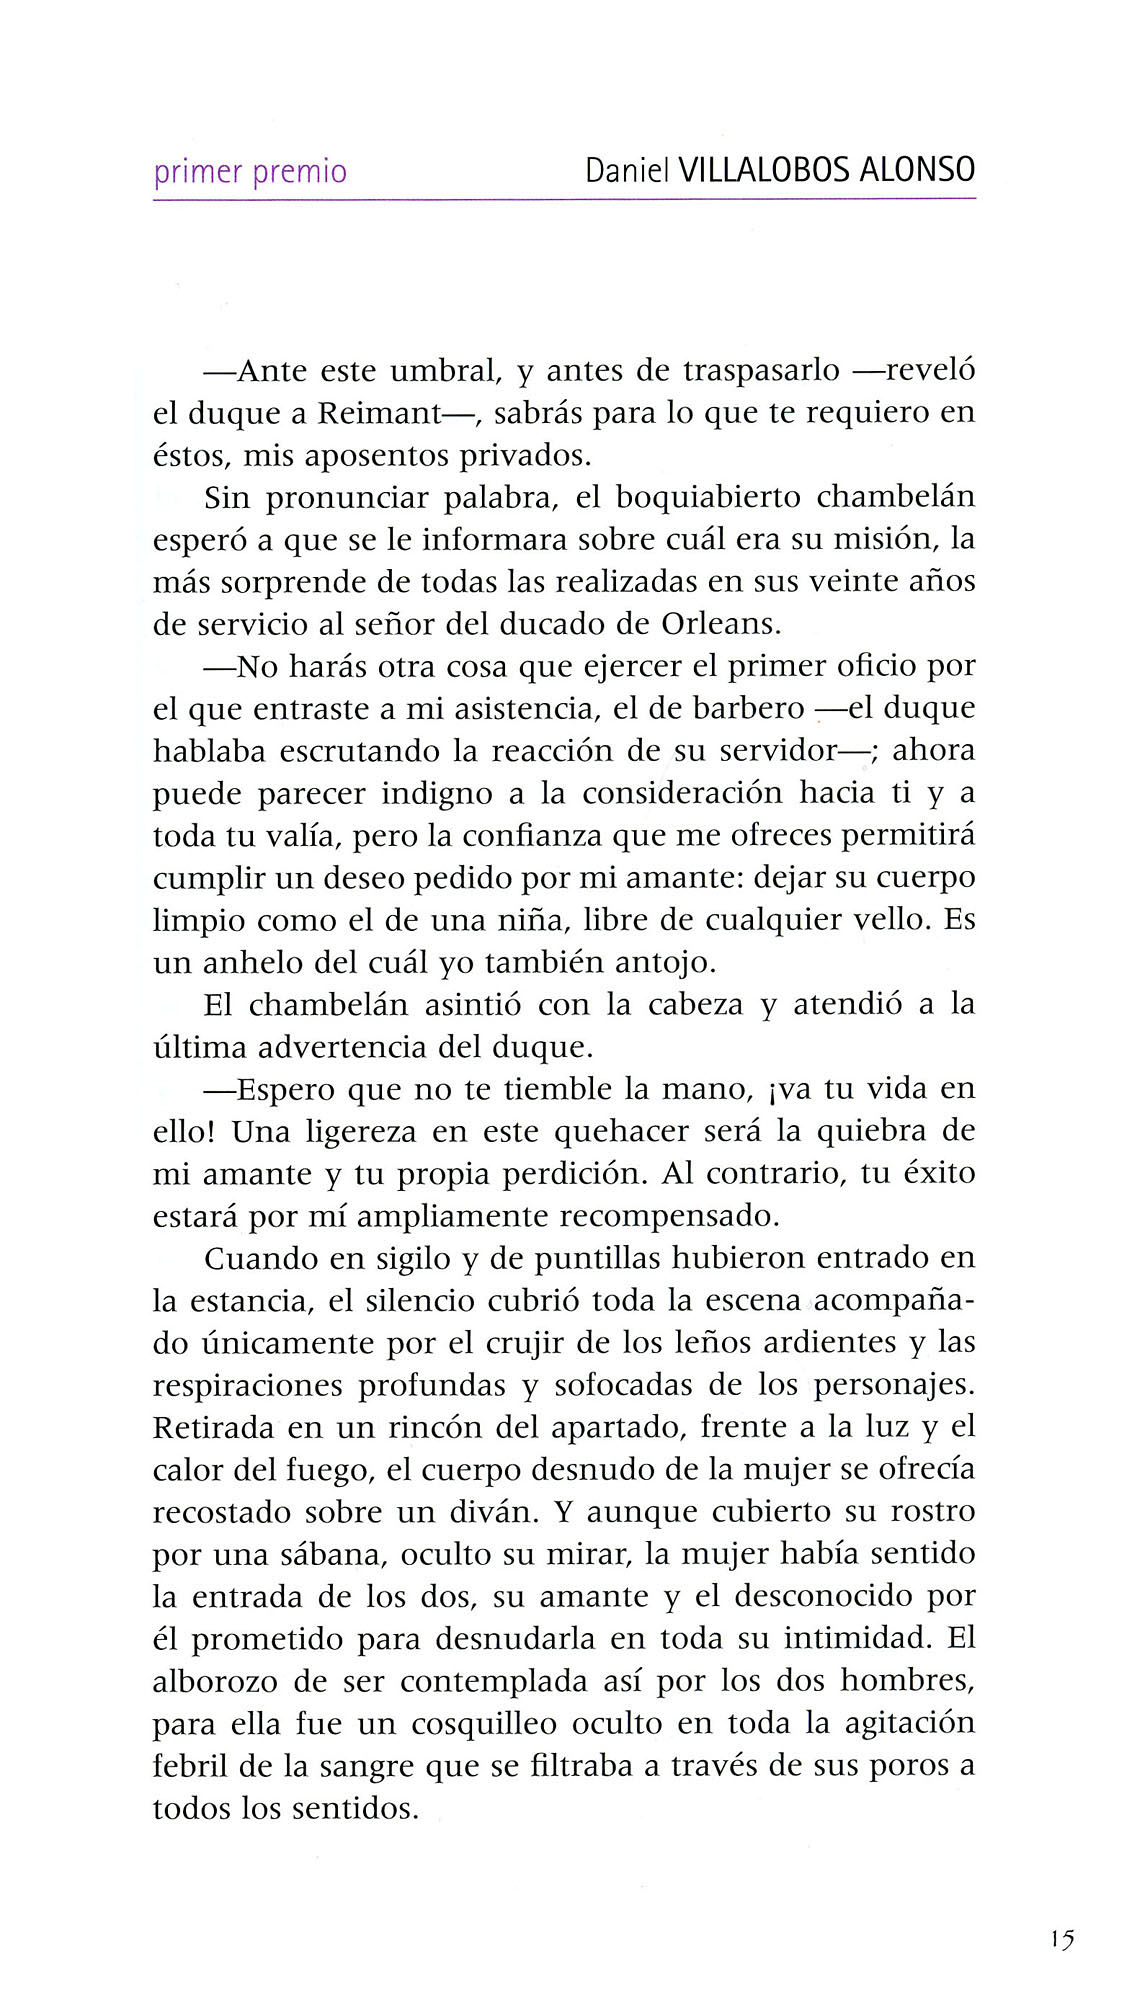 danielvillalobos-calderonsamaniego-story-storyerotic-spanishliterature-8